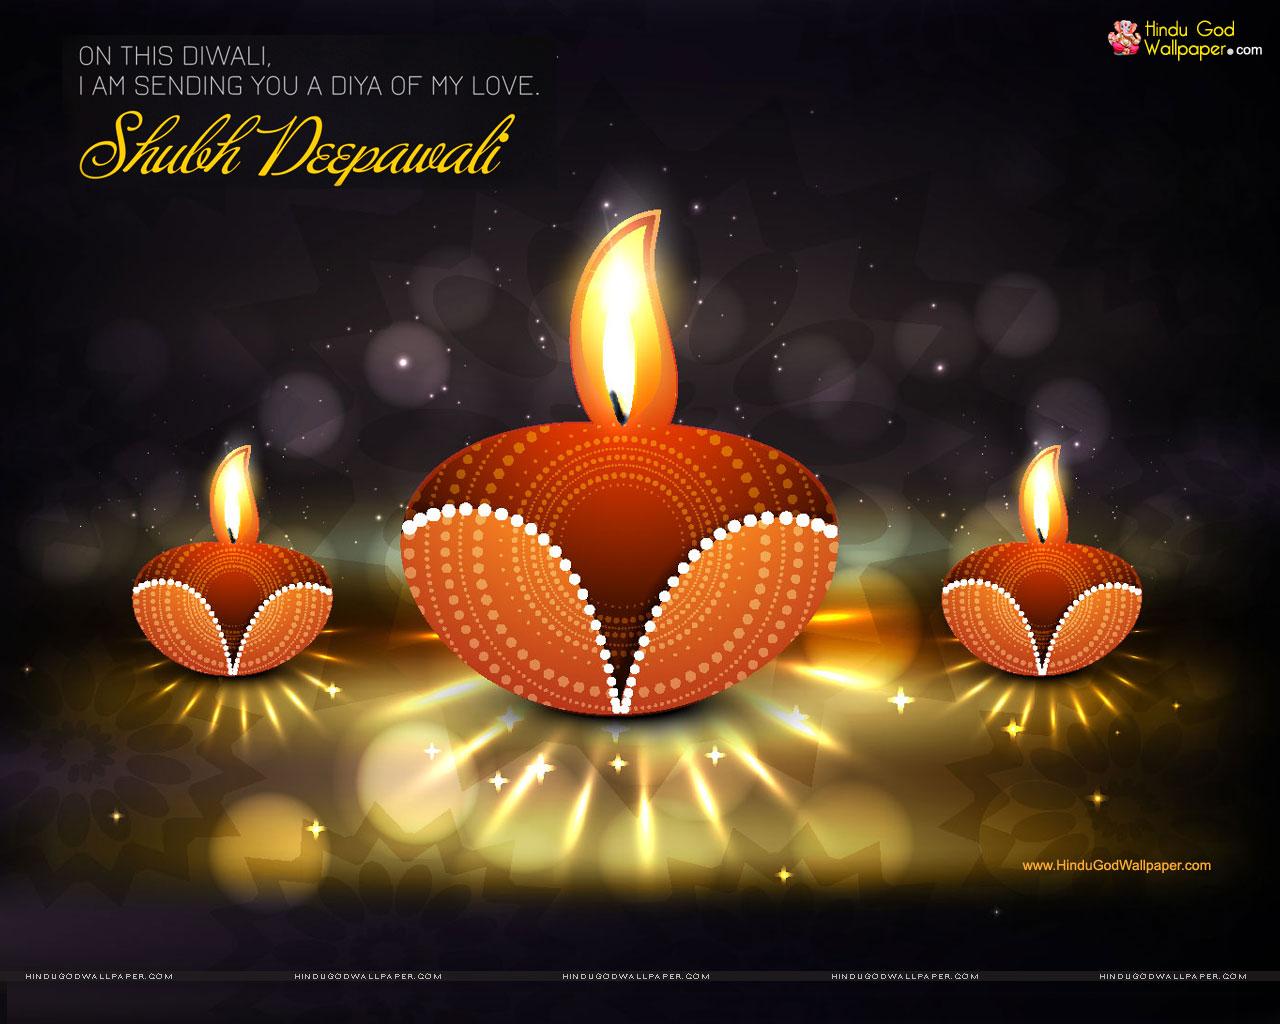 Popular Wallpaper High Quality Diwali - 1779_diwali-hd-wallpaper-08  2018_16398.jpg